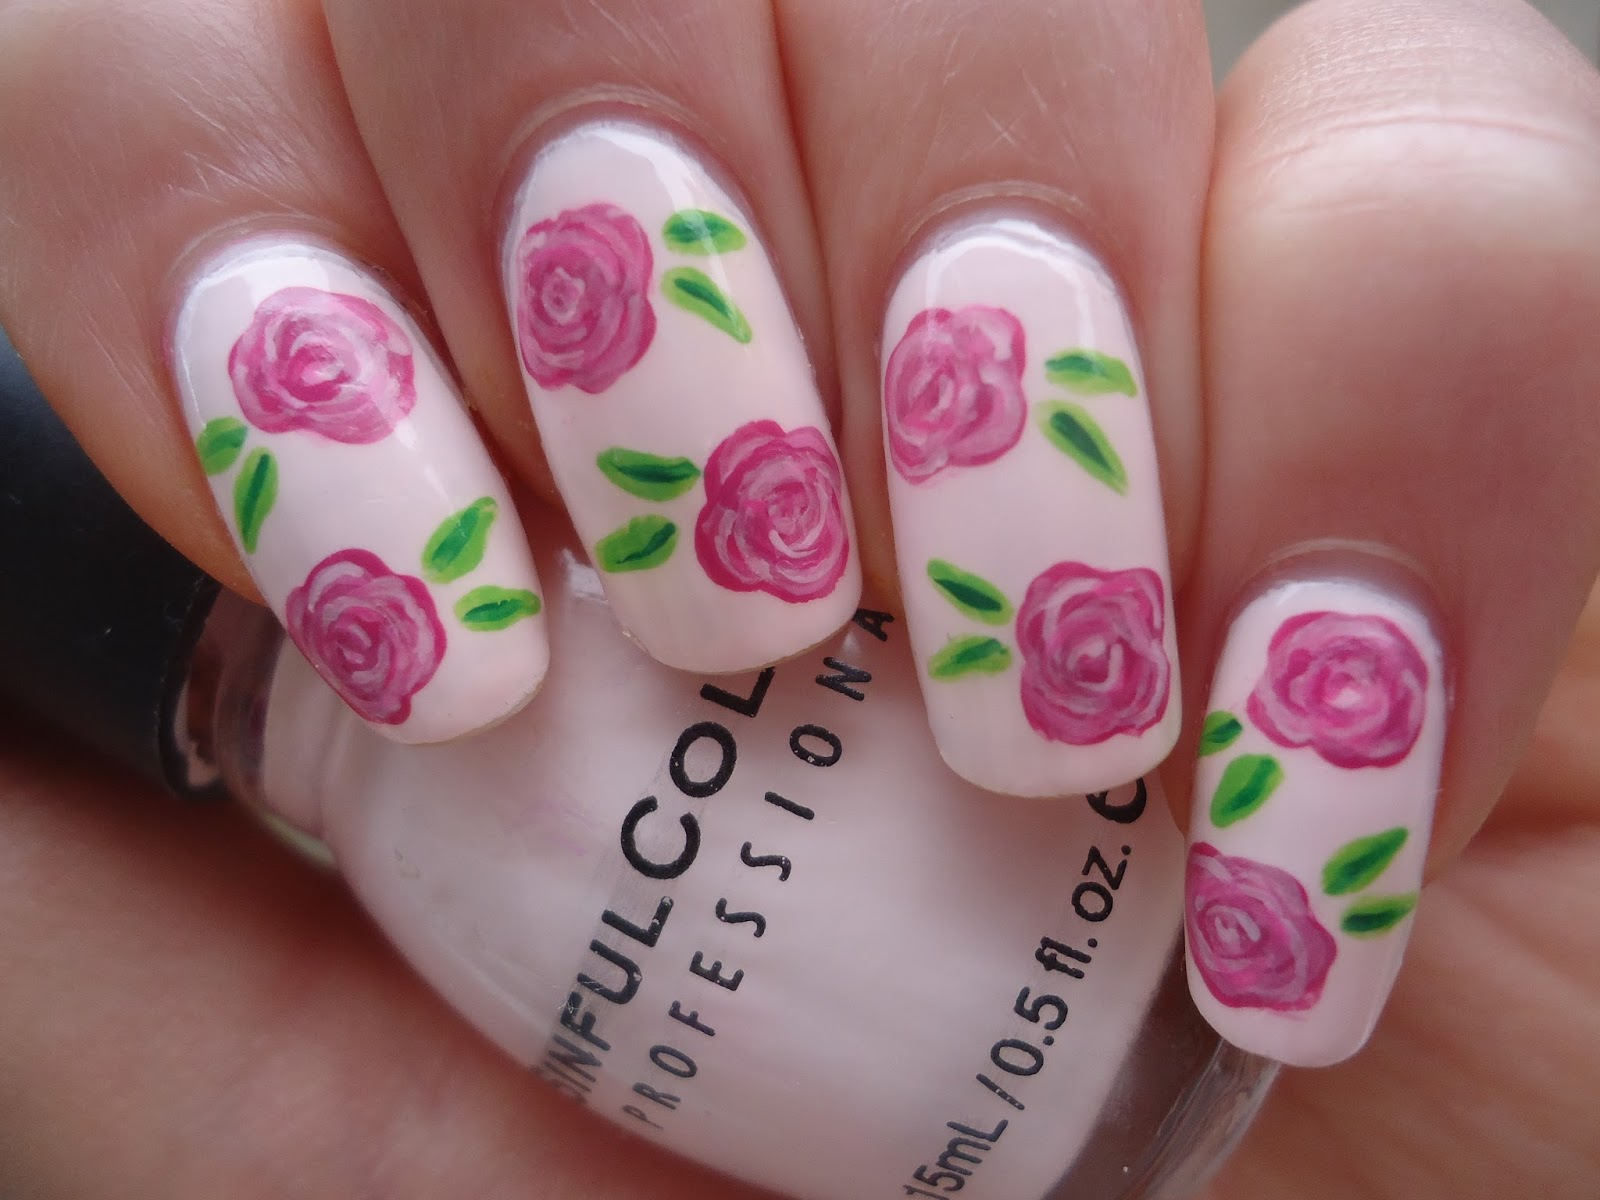 Рисунки на ногтях в домашних условиях 1 фотография